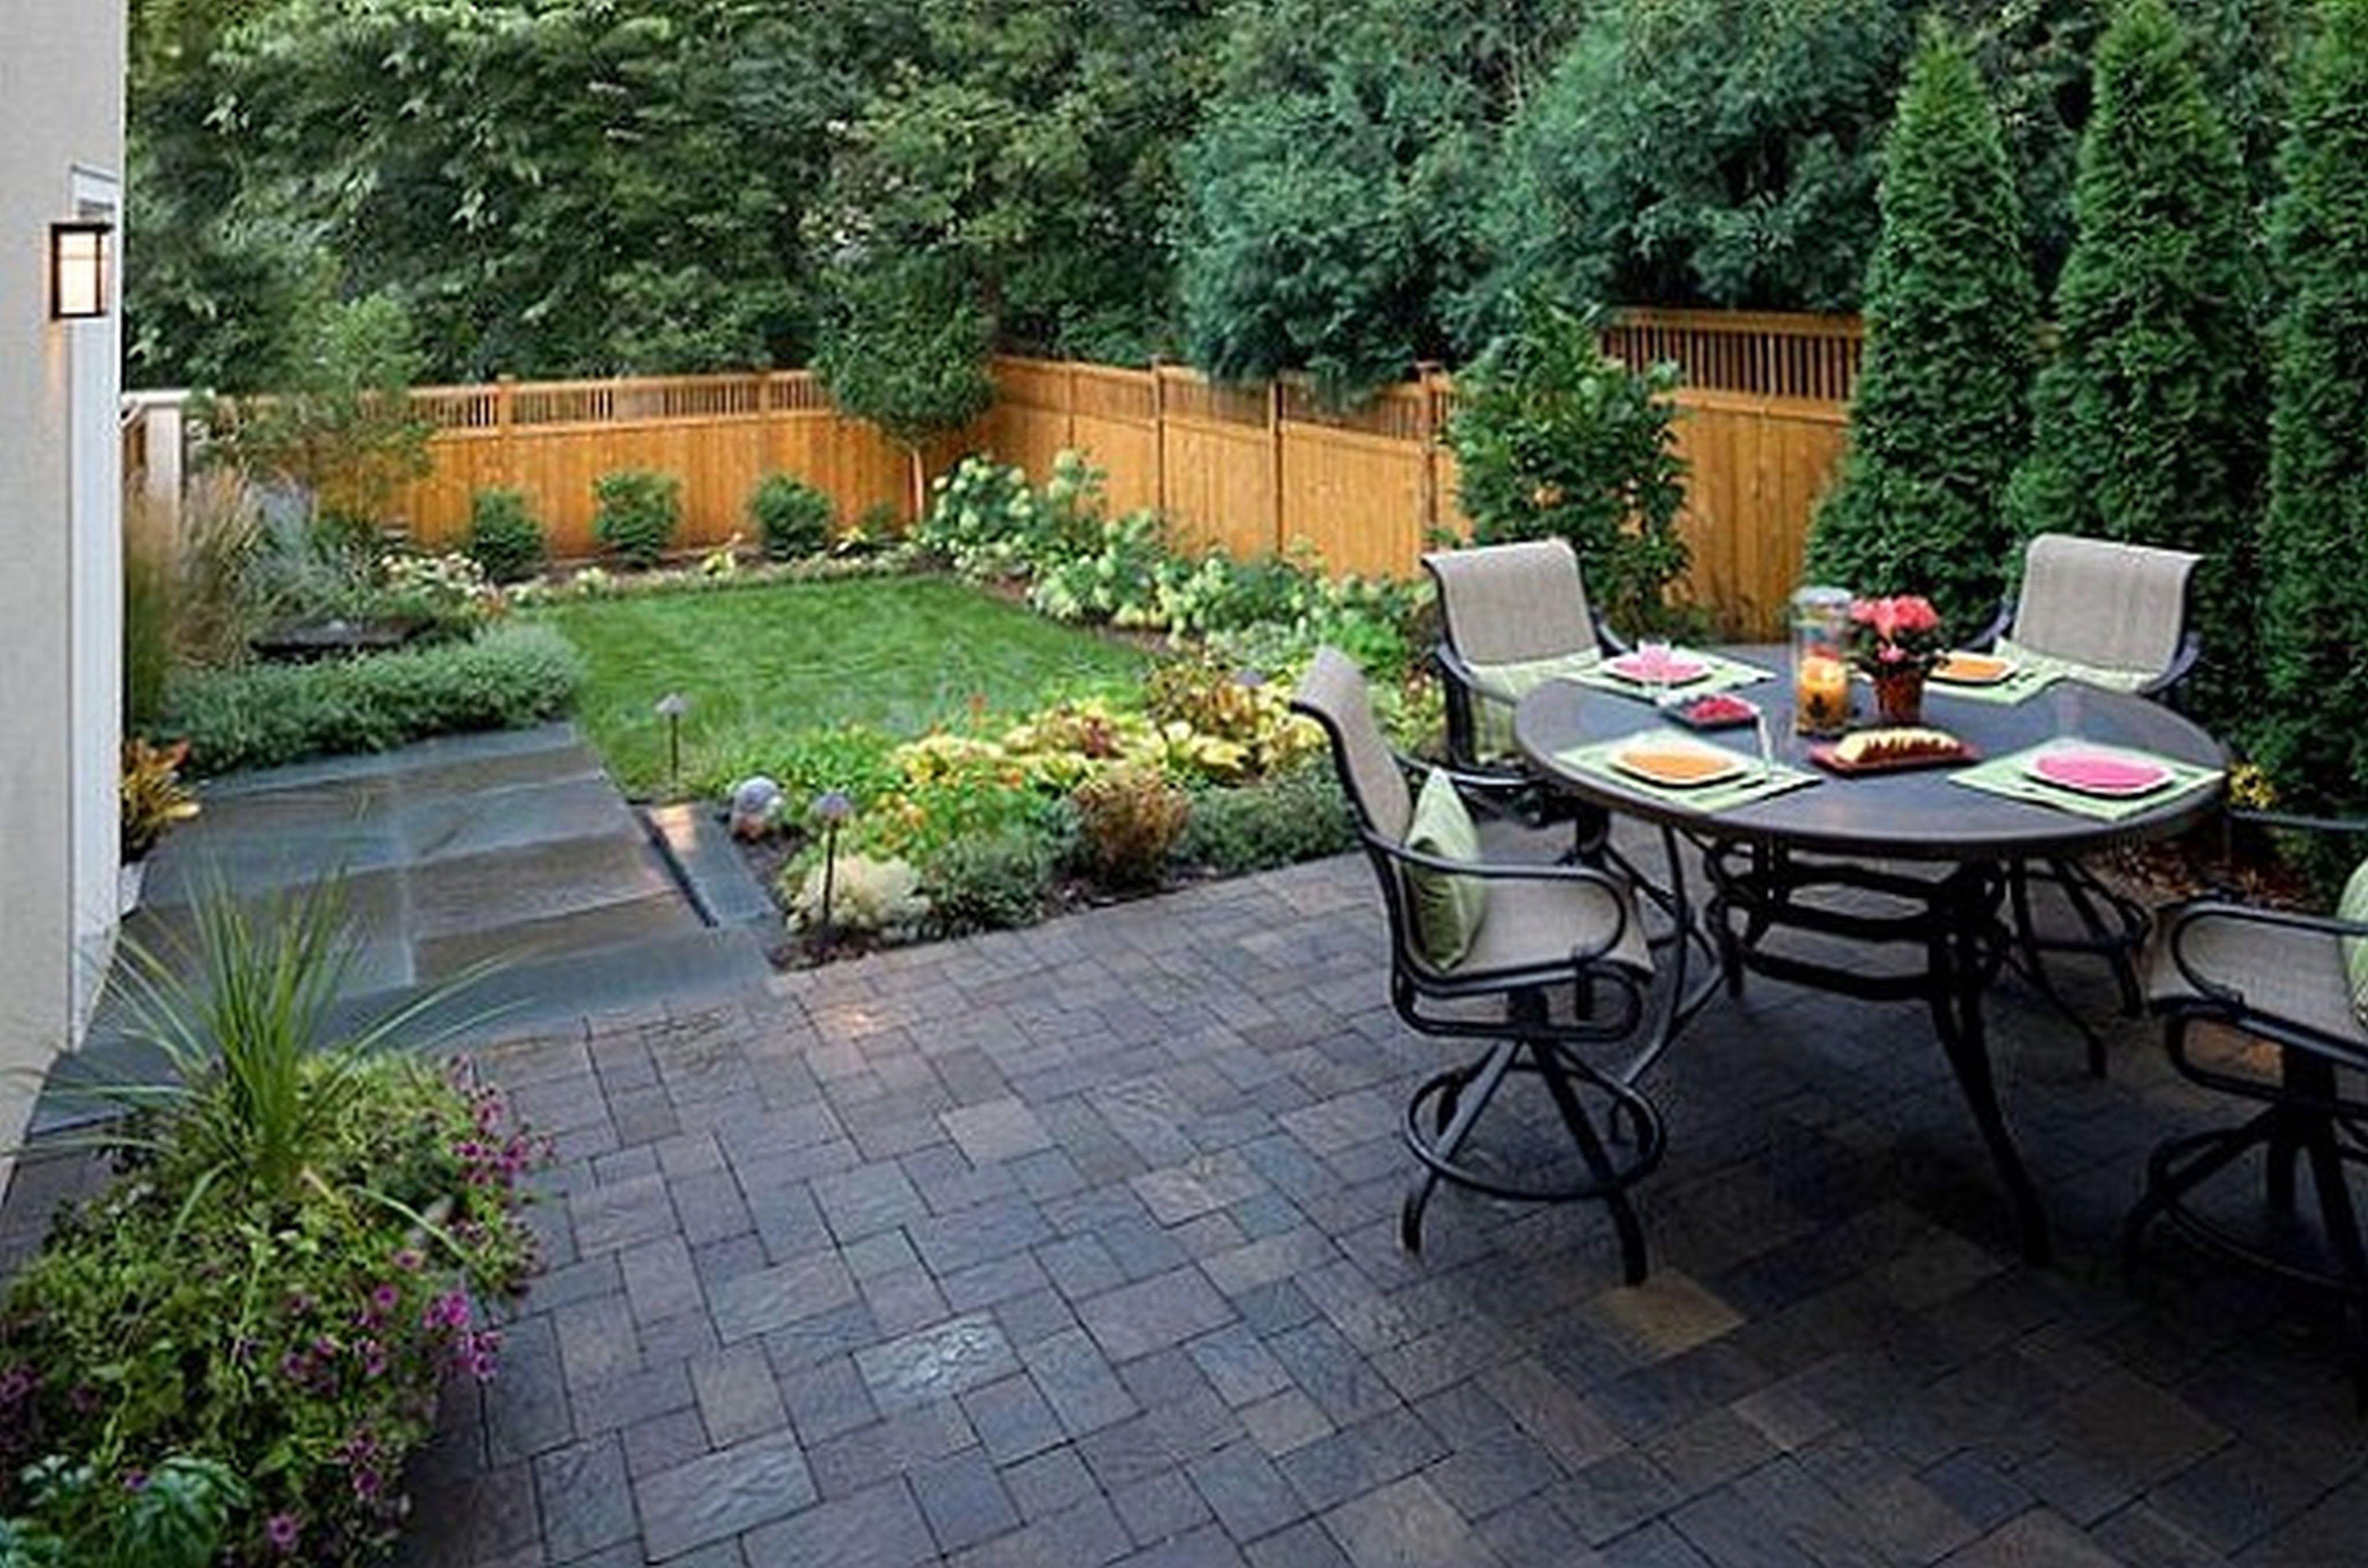 Urban Patio Garden Stylish Small Design Ideas Modern Of 20 Within Dimensions 4096 X 2712